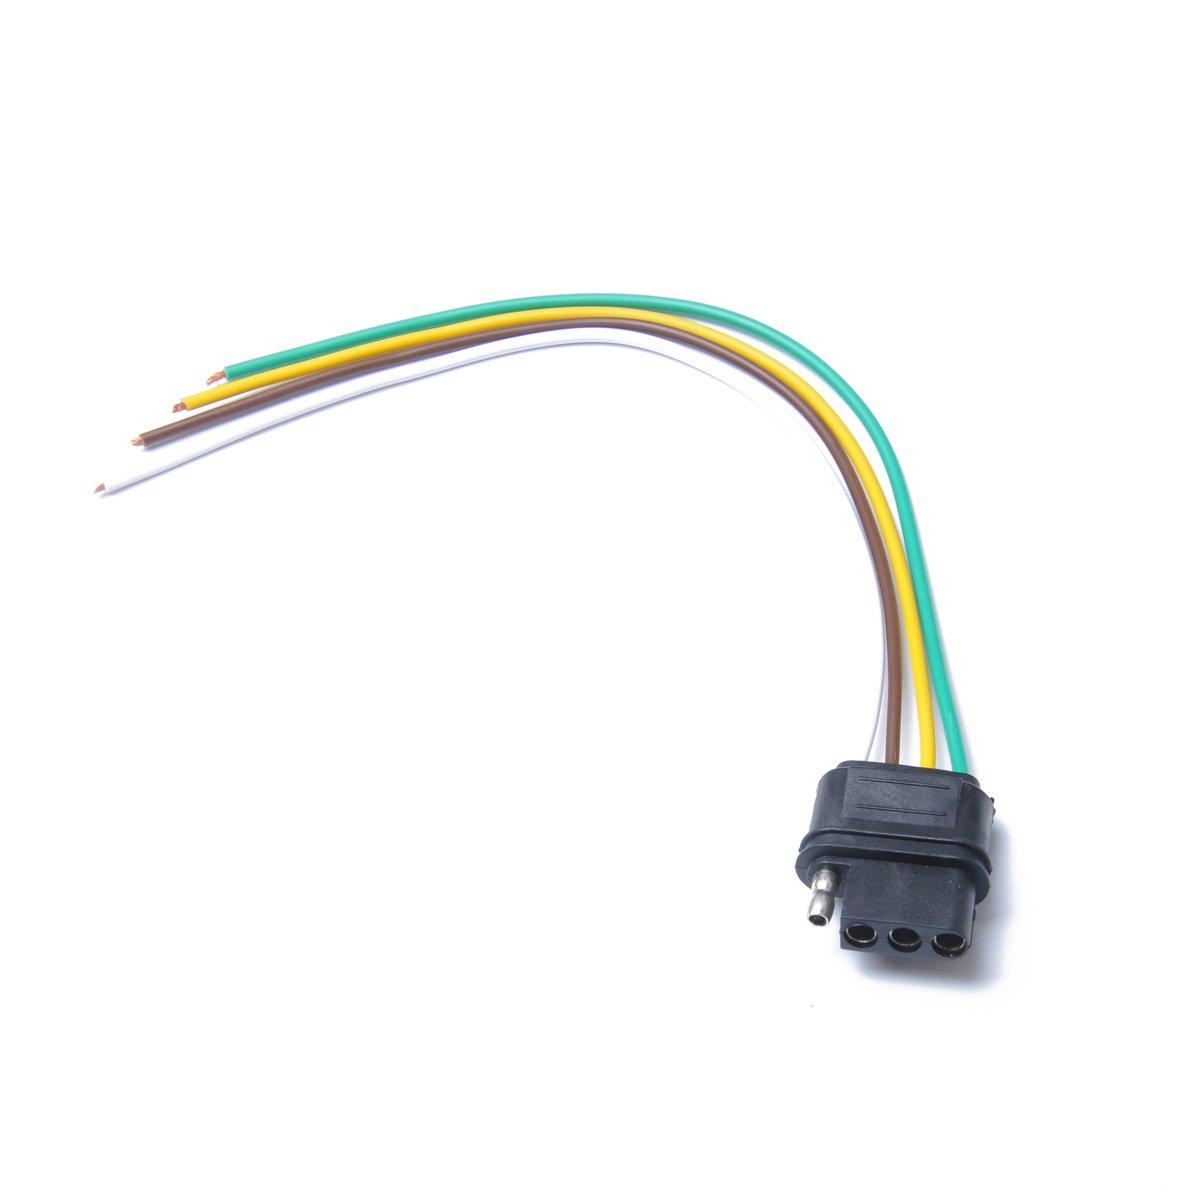 Awe Inspiring Amazon Com Winomo 4 Way Flat Trailer Wire Harness Extension Hitch Wiring 101 Archstreekradiomeanderfmnl